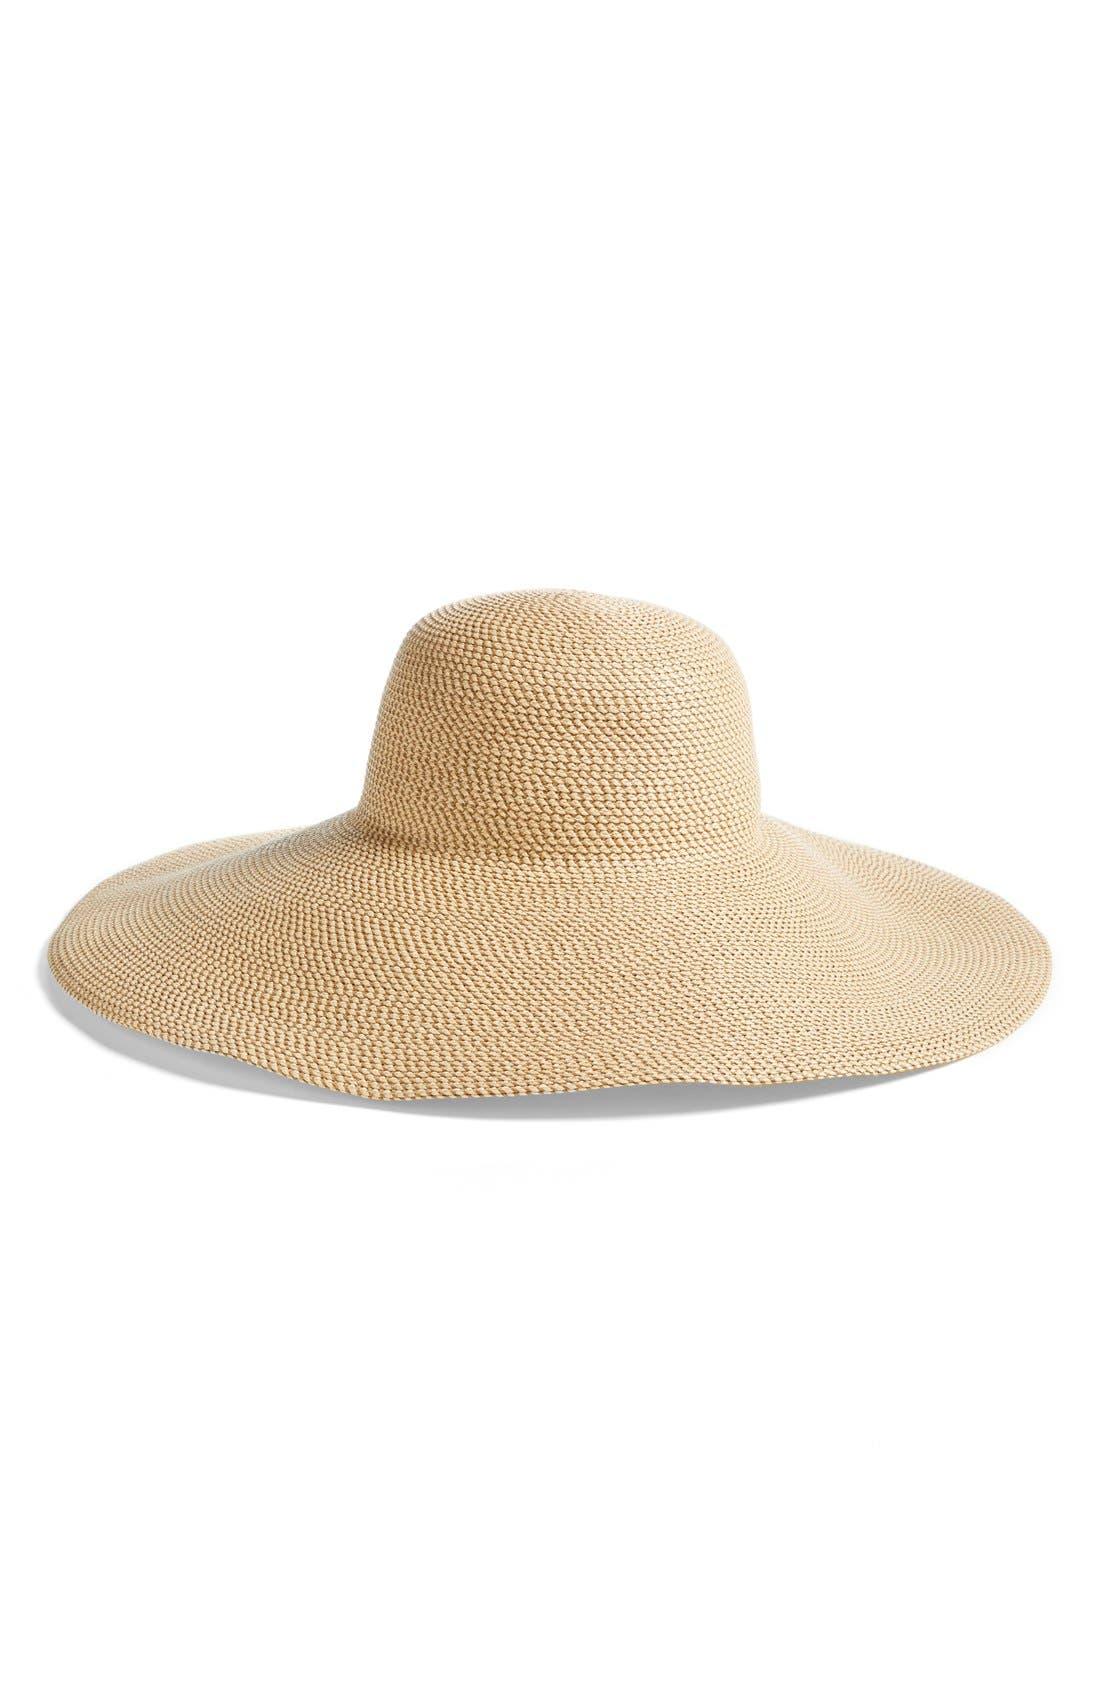 Floppy Straw Hat,                             Main thumbnail 1, color,                             PEANUT